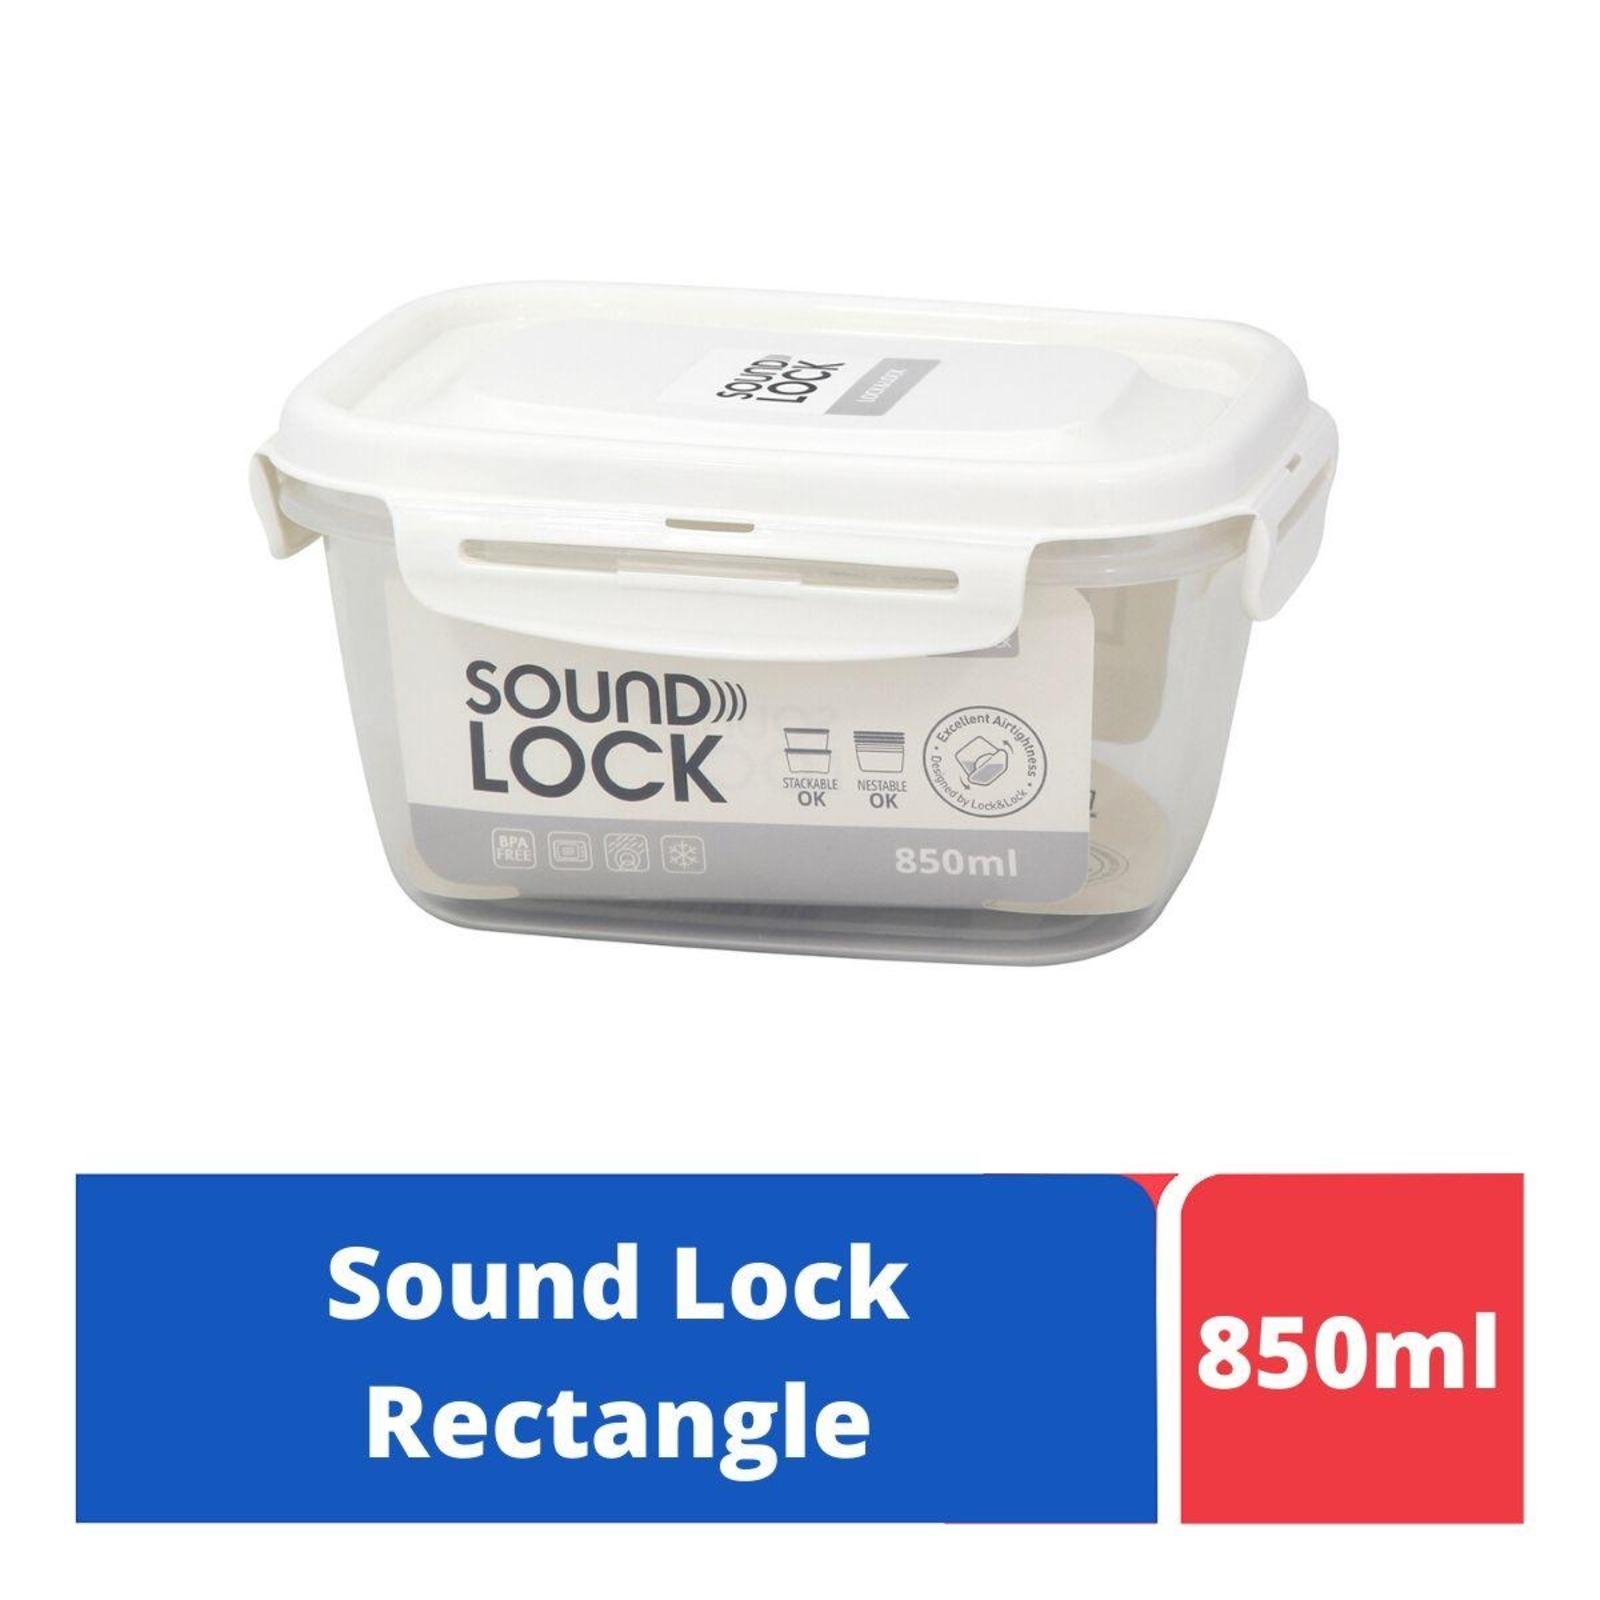 LOCK&LOCK Sound Lock Rect Food Container 850ml - White